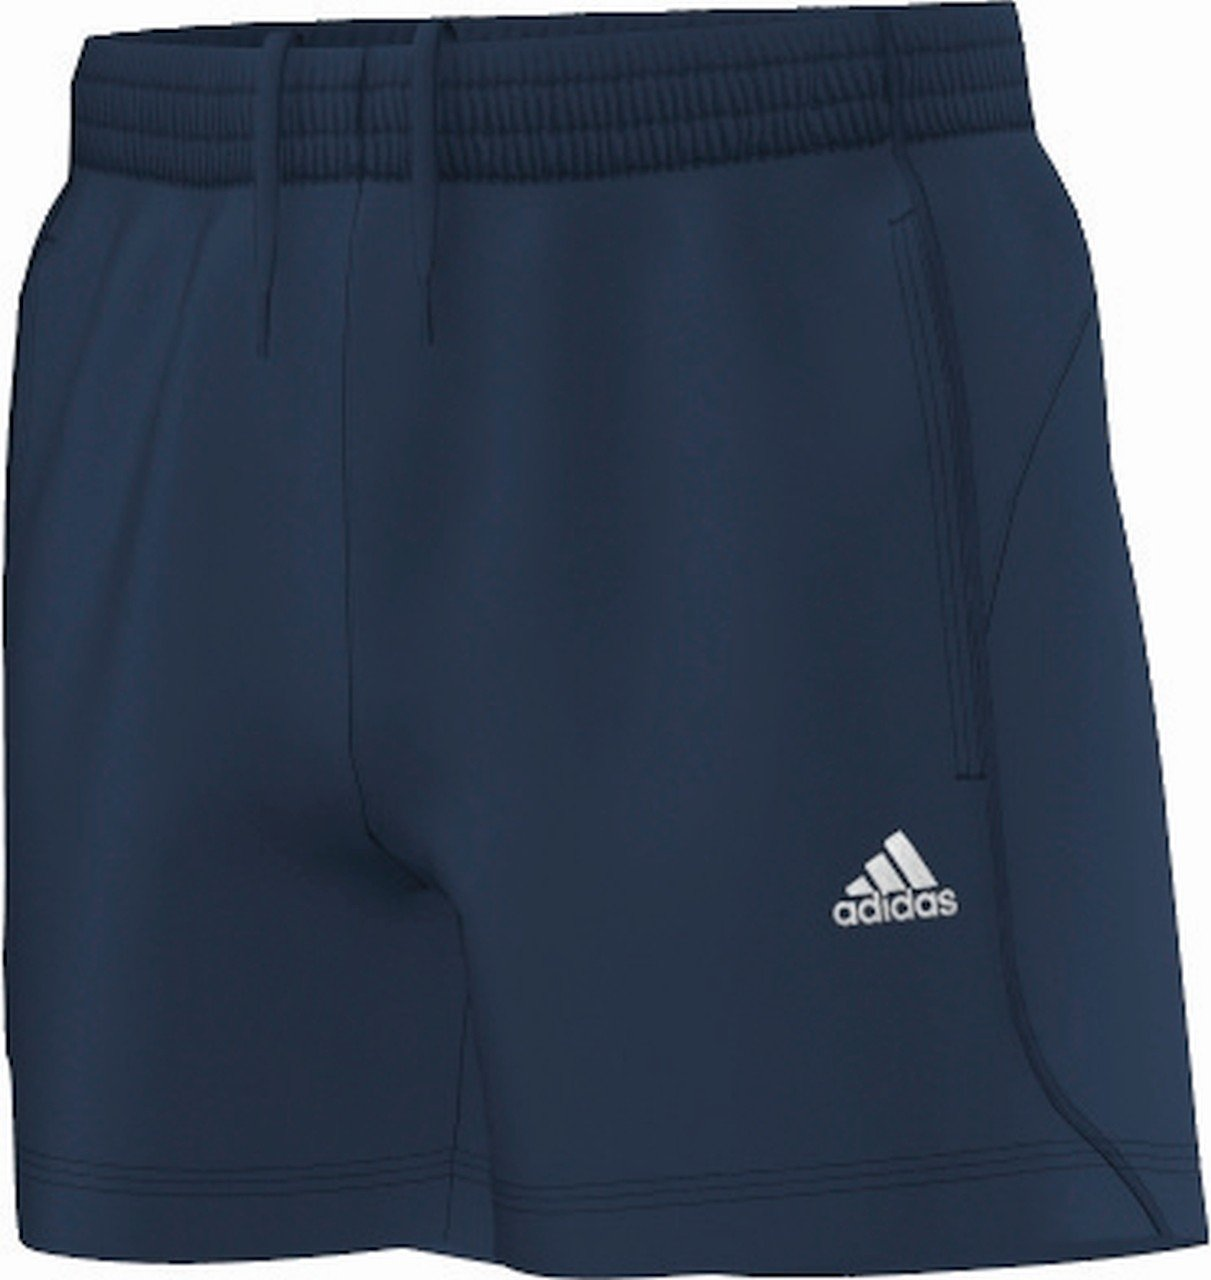 adidas Kinder Shorts Essentials Chelsea Z29708